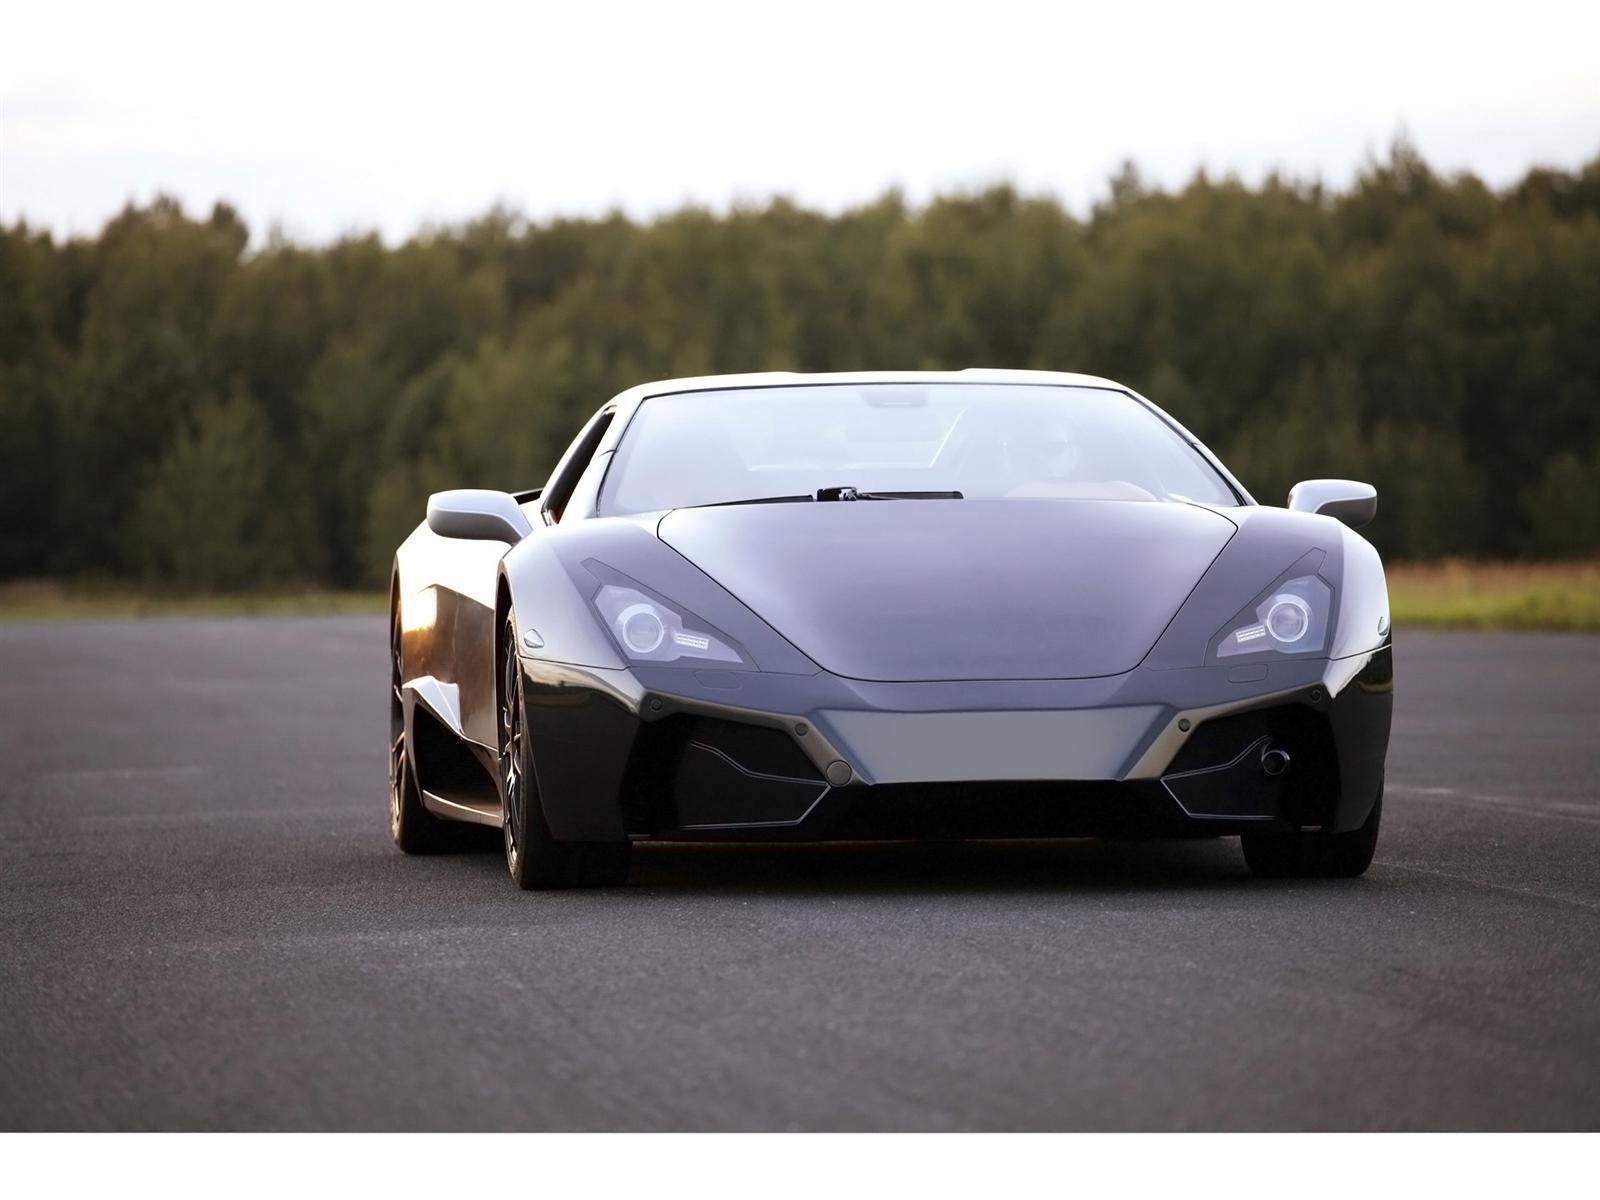 Arrinera Supercar 2012 New Model Car Automobile For Life